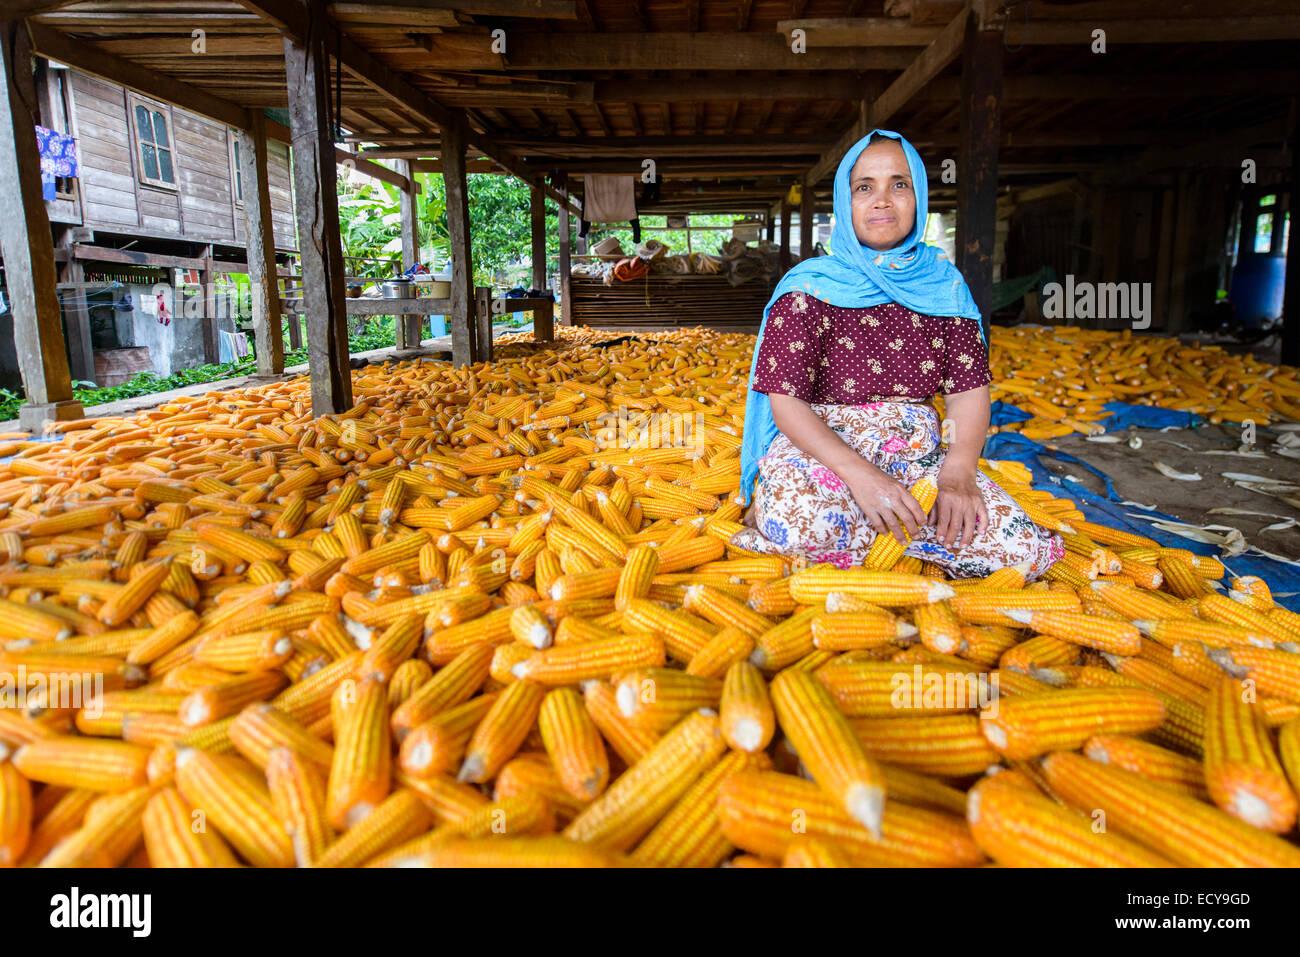 Woman sitting between corn cobs, Sulawesi, Indonesia - Stock Image